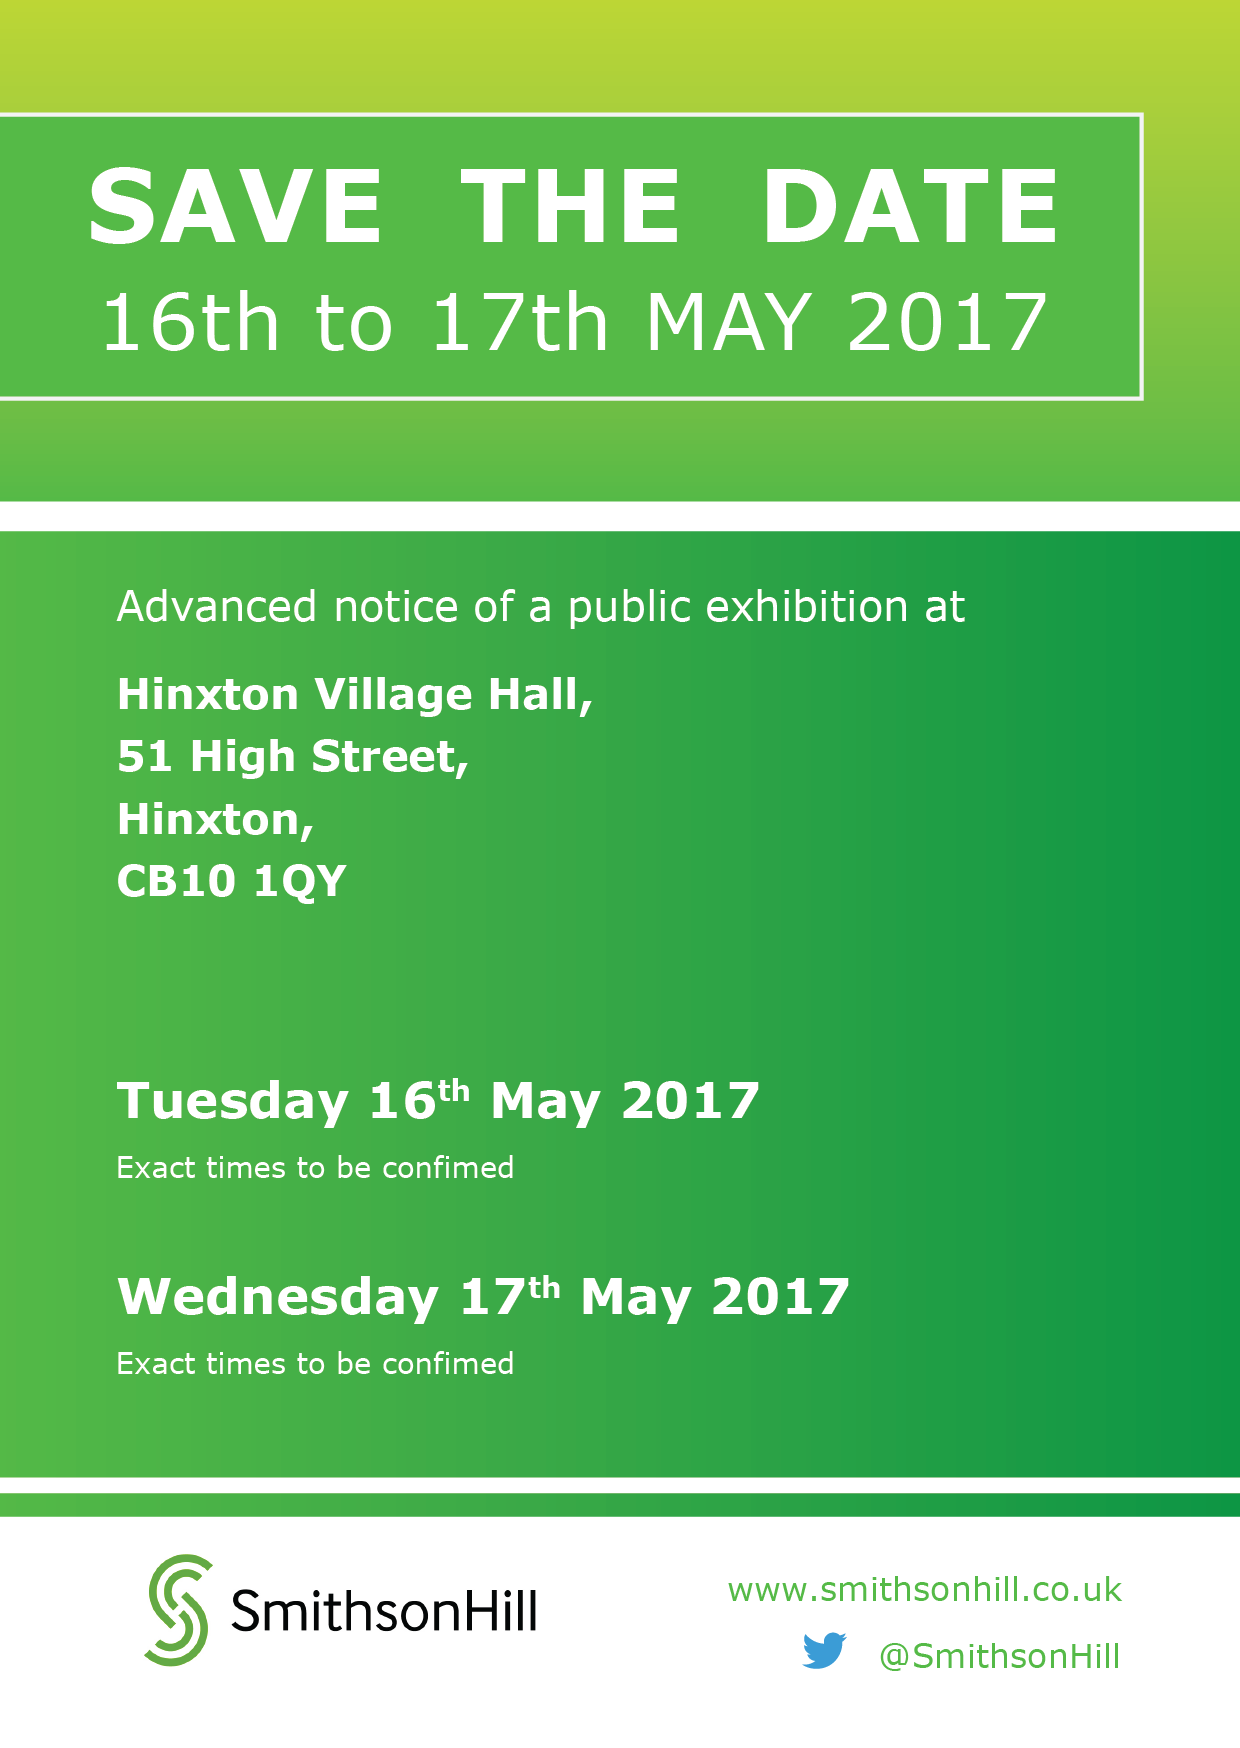 Save the date, Public exhibition